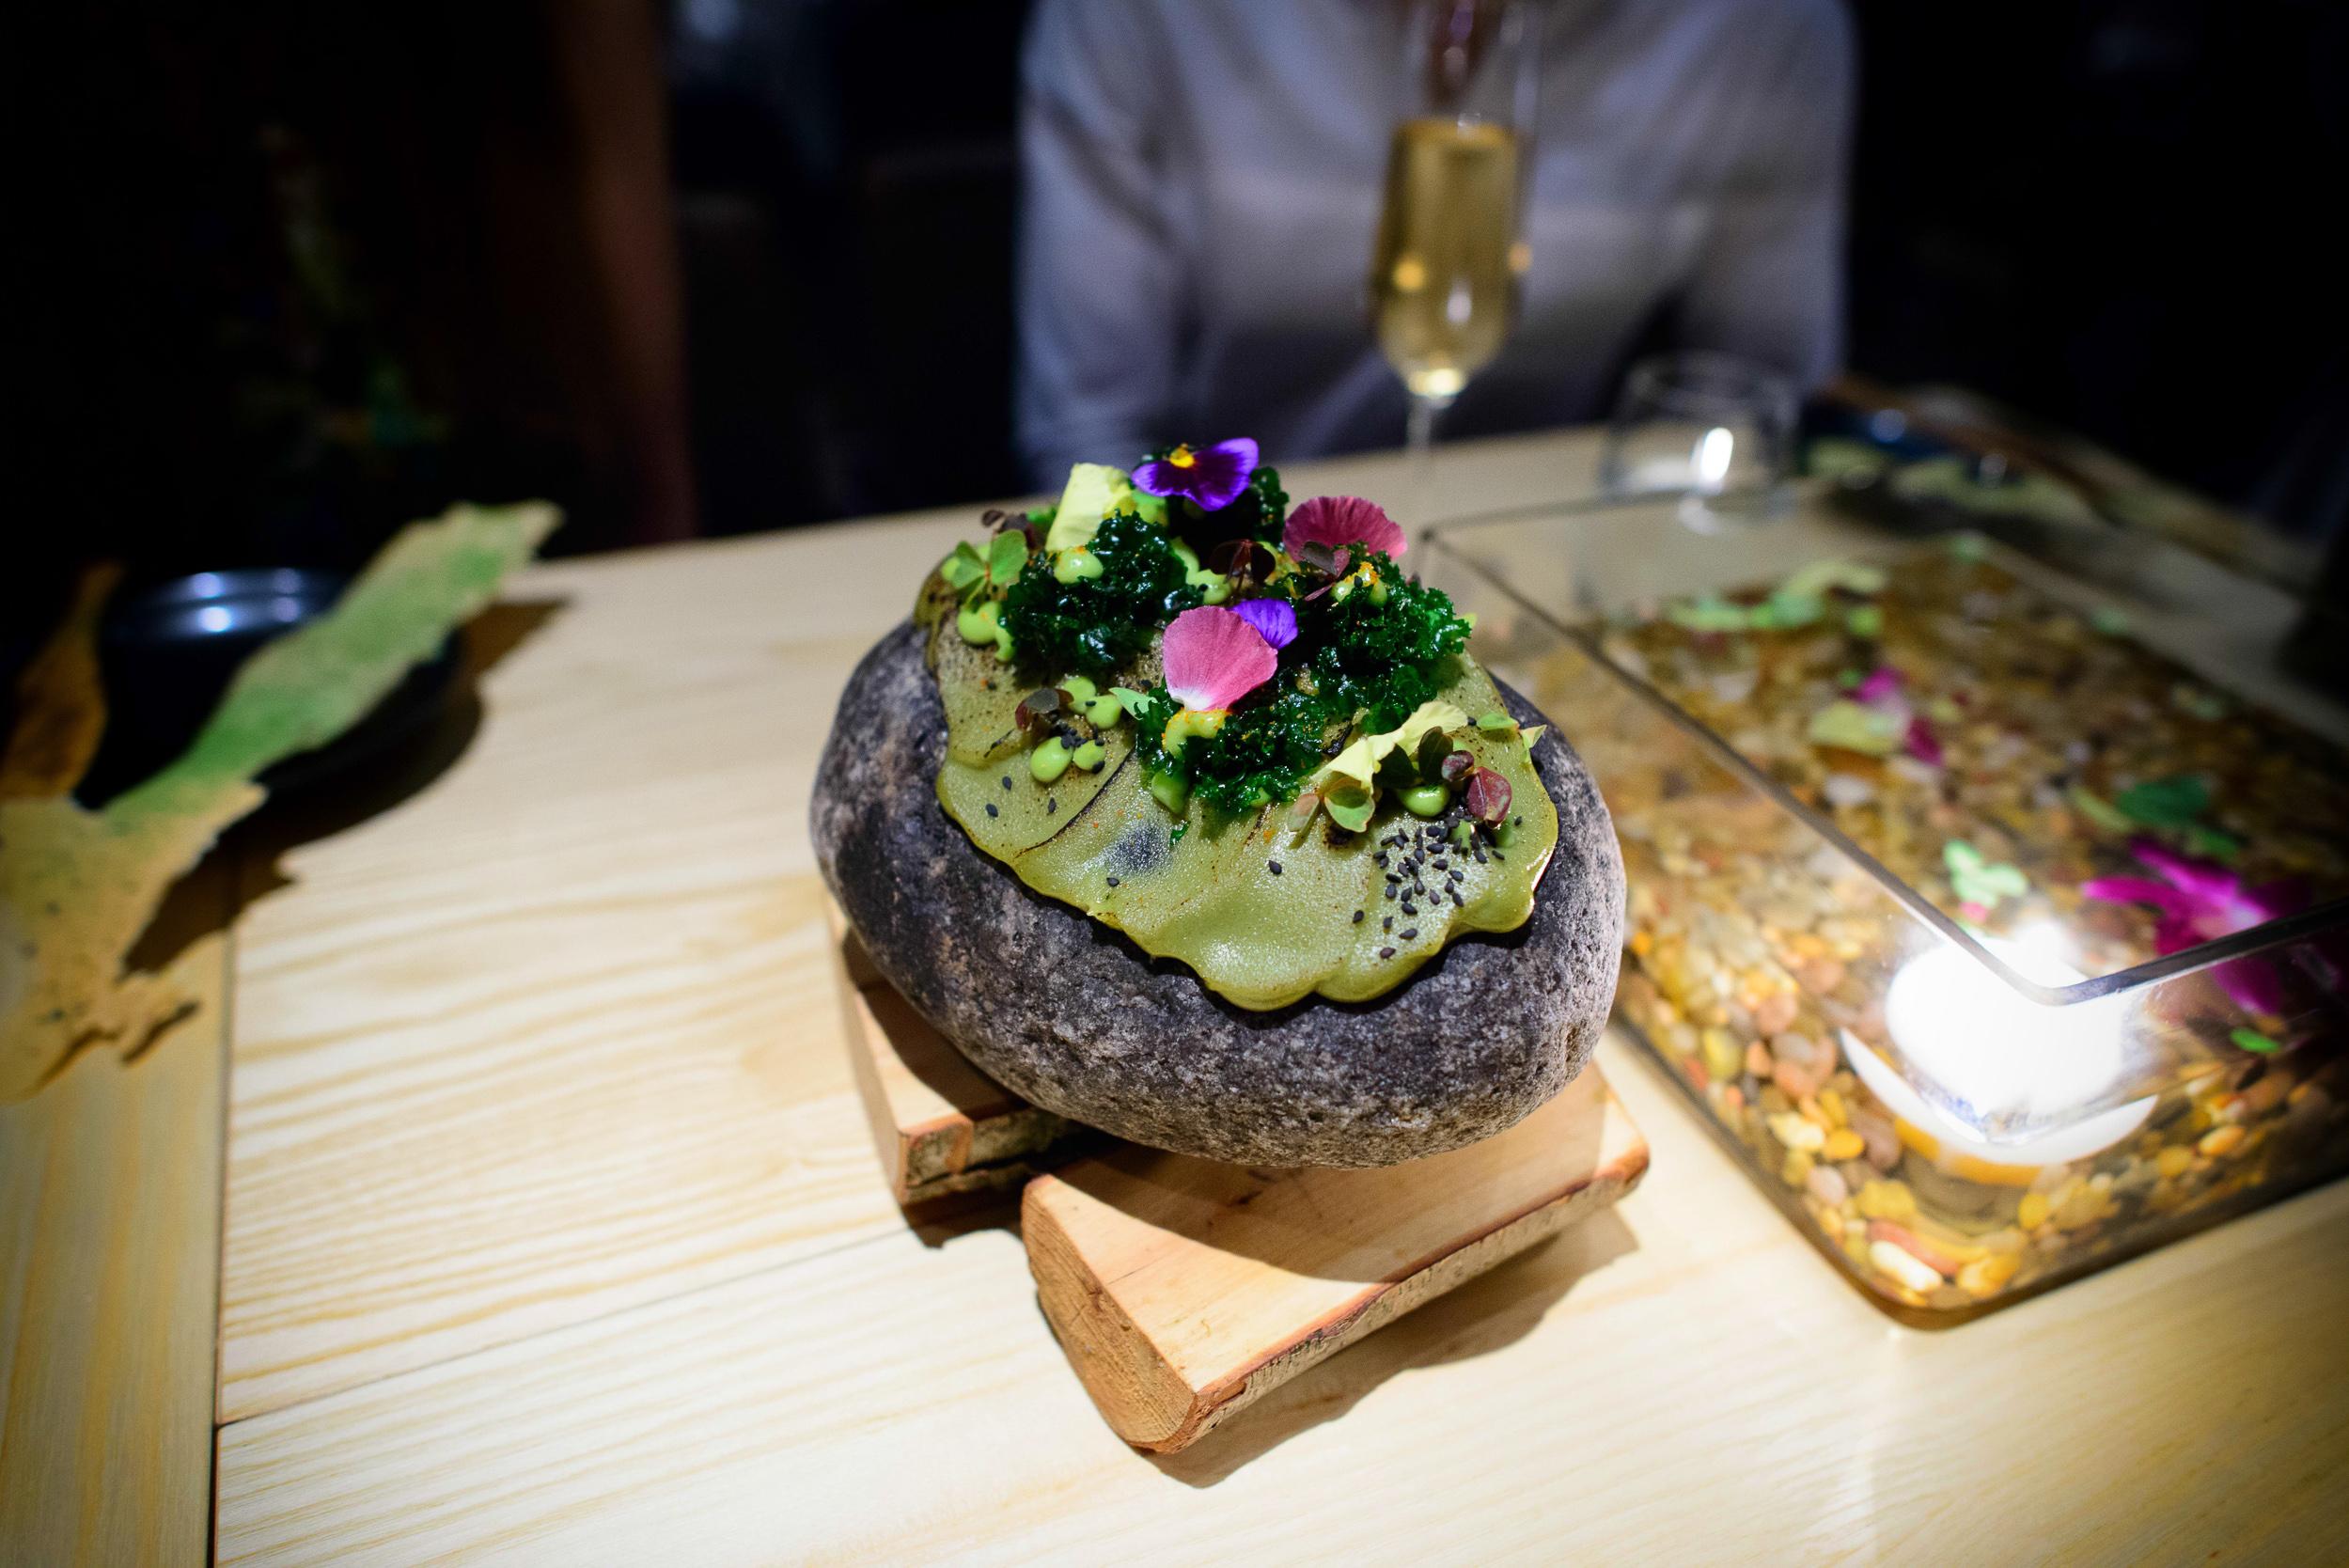 1st Course: Starter and Burnt Avocado (mousse of avocado, togara